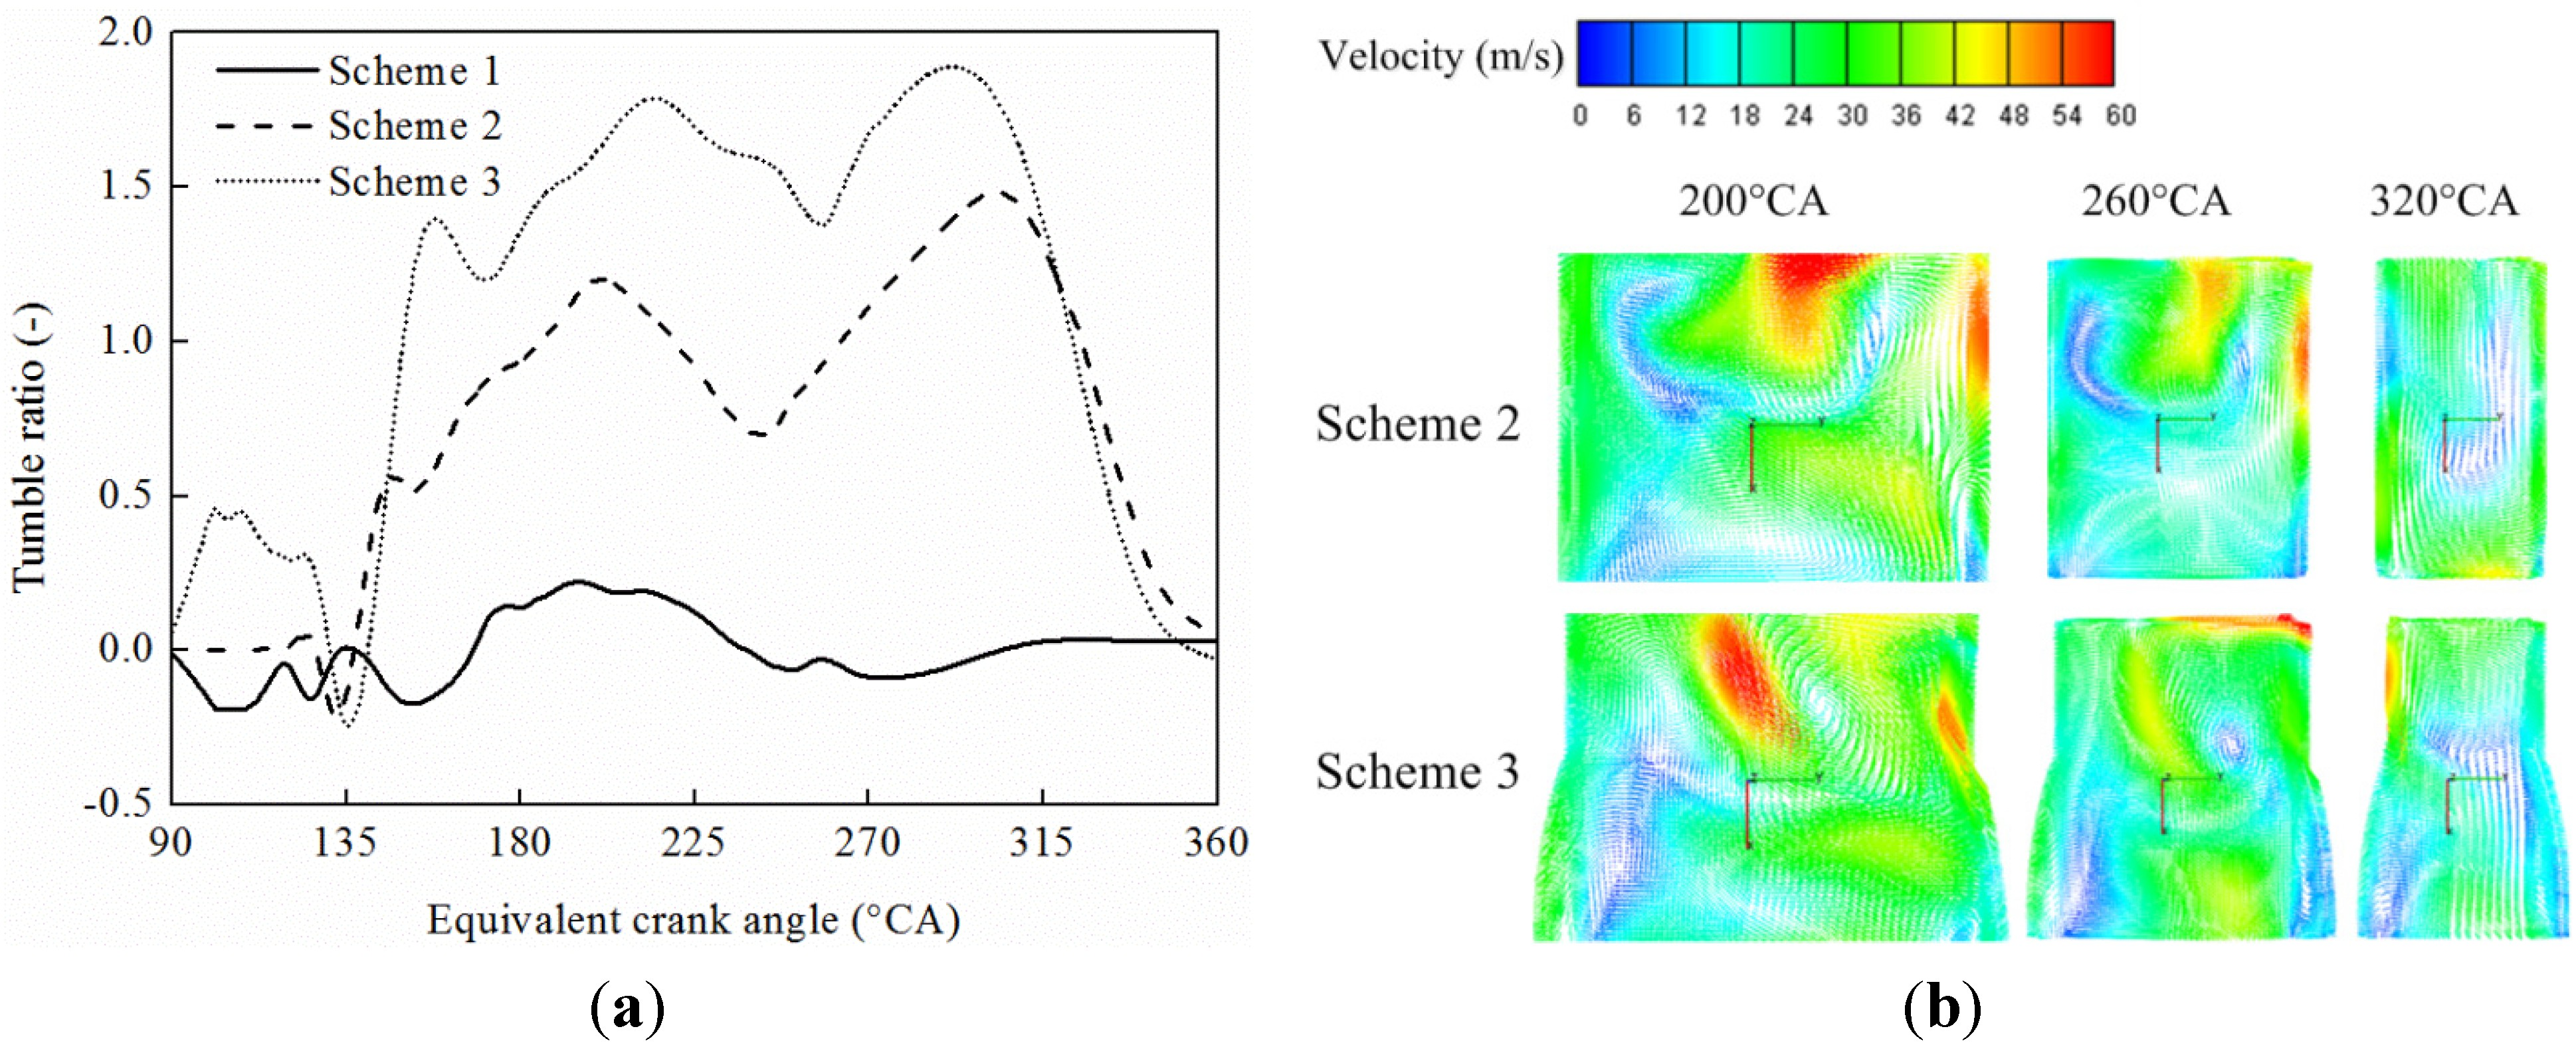 Two Stroke Engine Pv Diagram Energies Free Full Text Of Two Stroke Engine Pv Diagram